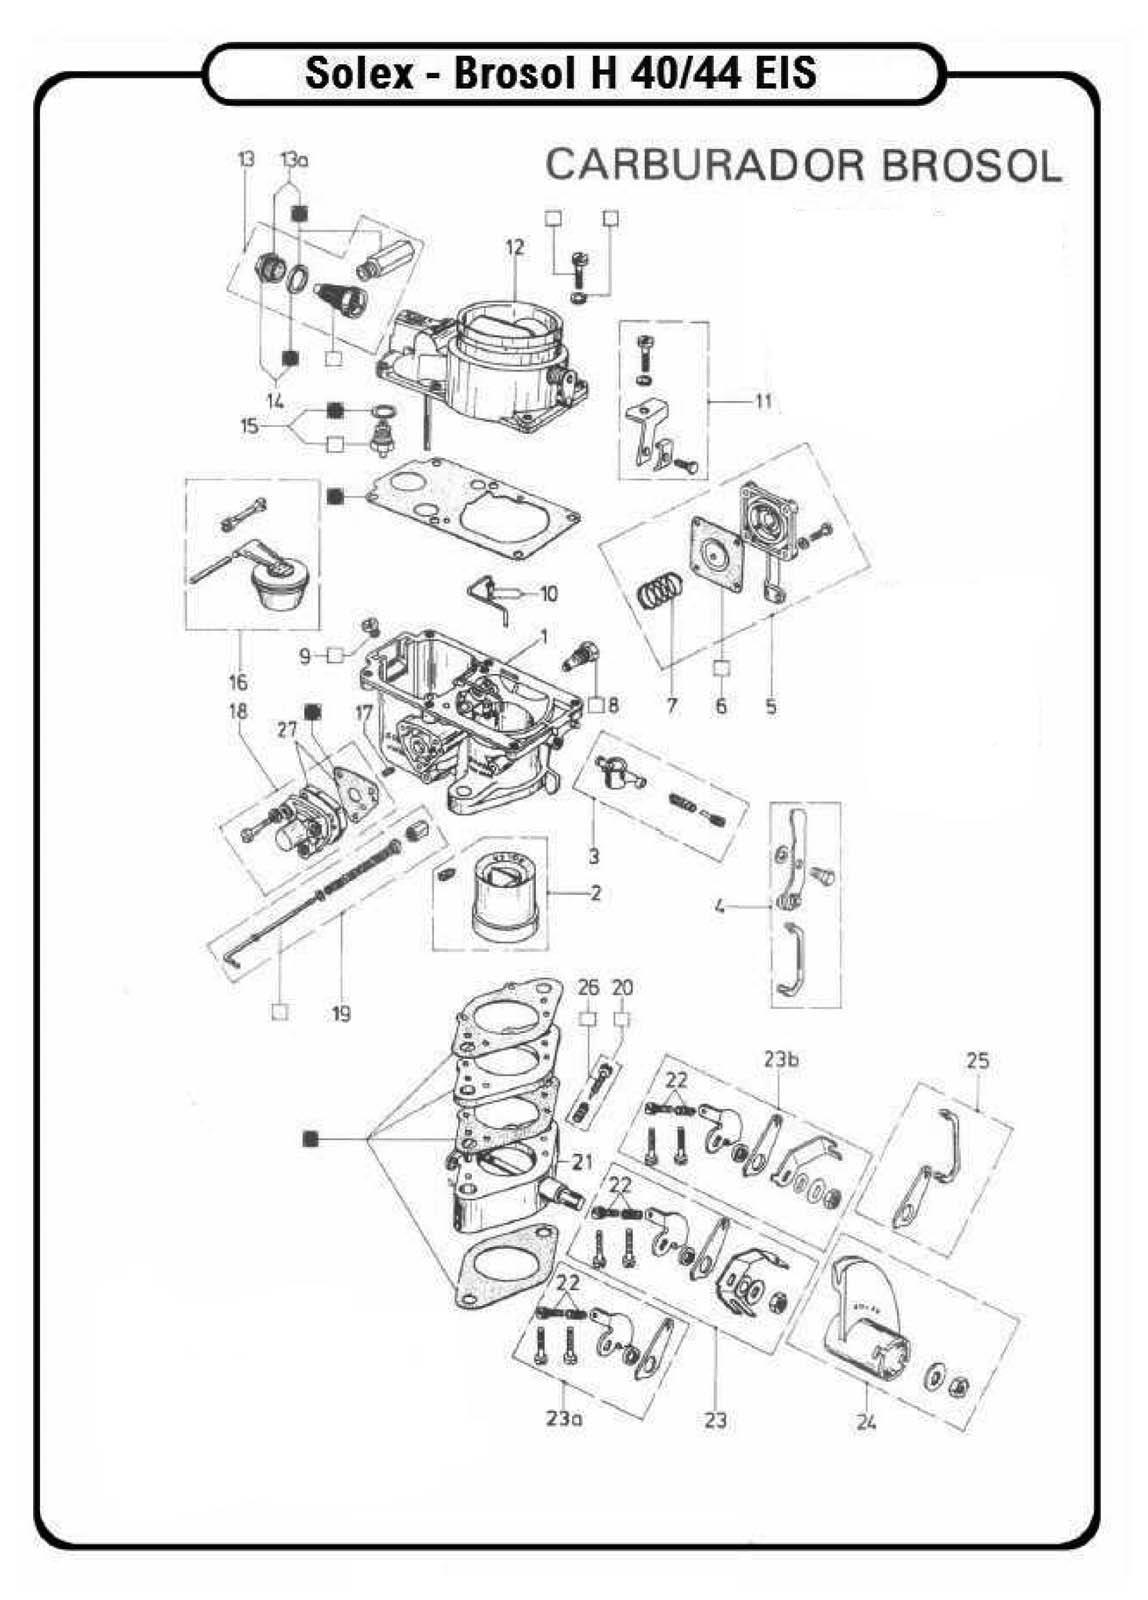 94 vw jetta parts diagram pioneer car cd player wiring 1971 volkswagen super beetle engine